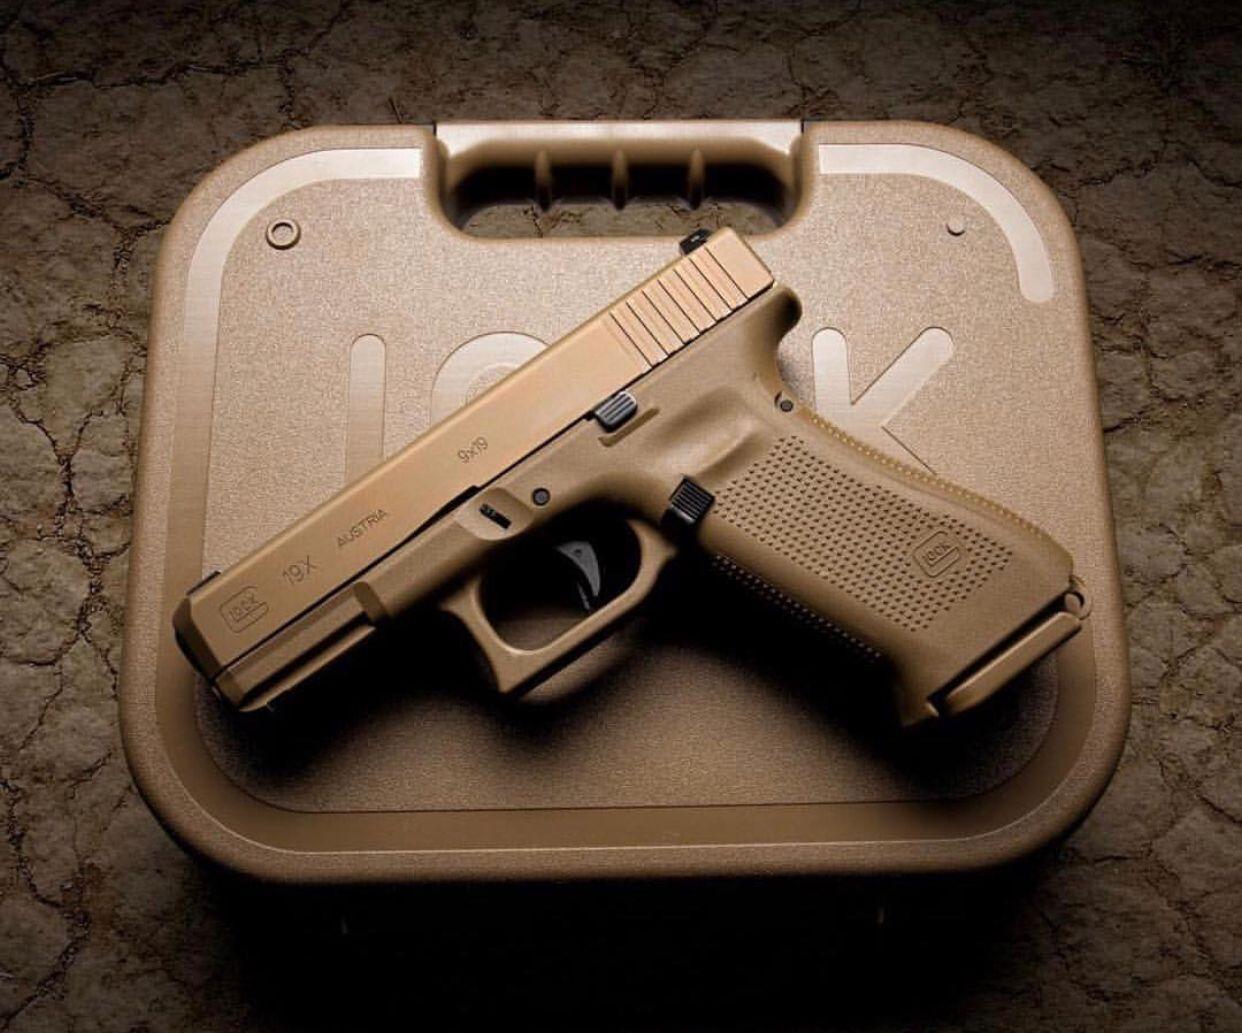 Glock 19X | Glock | Guns, Glock mods, Hand guns